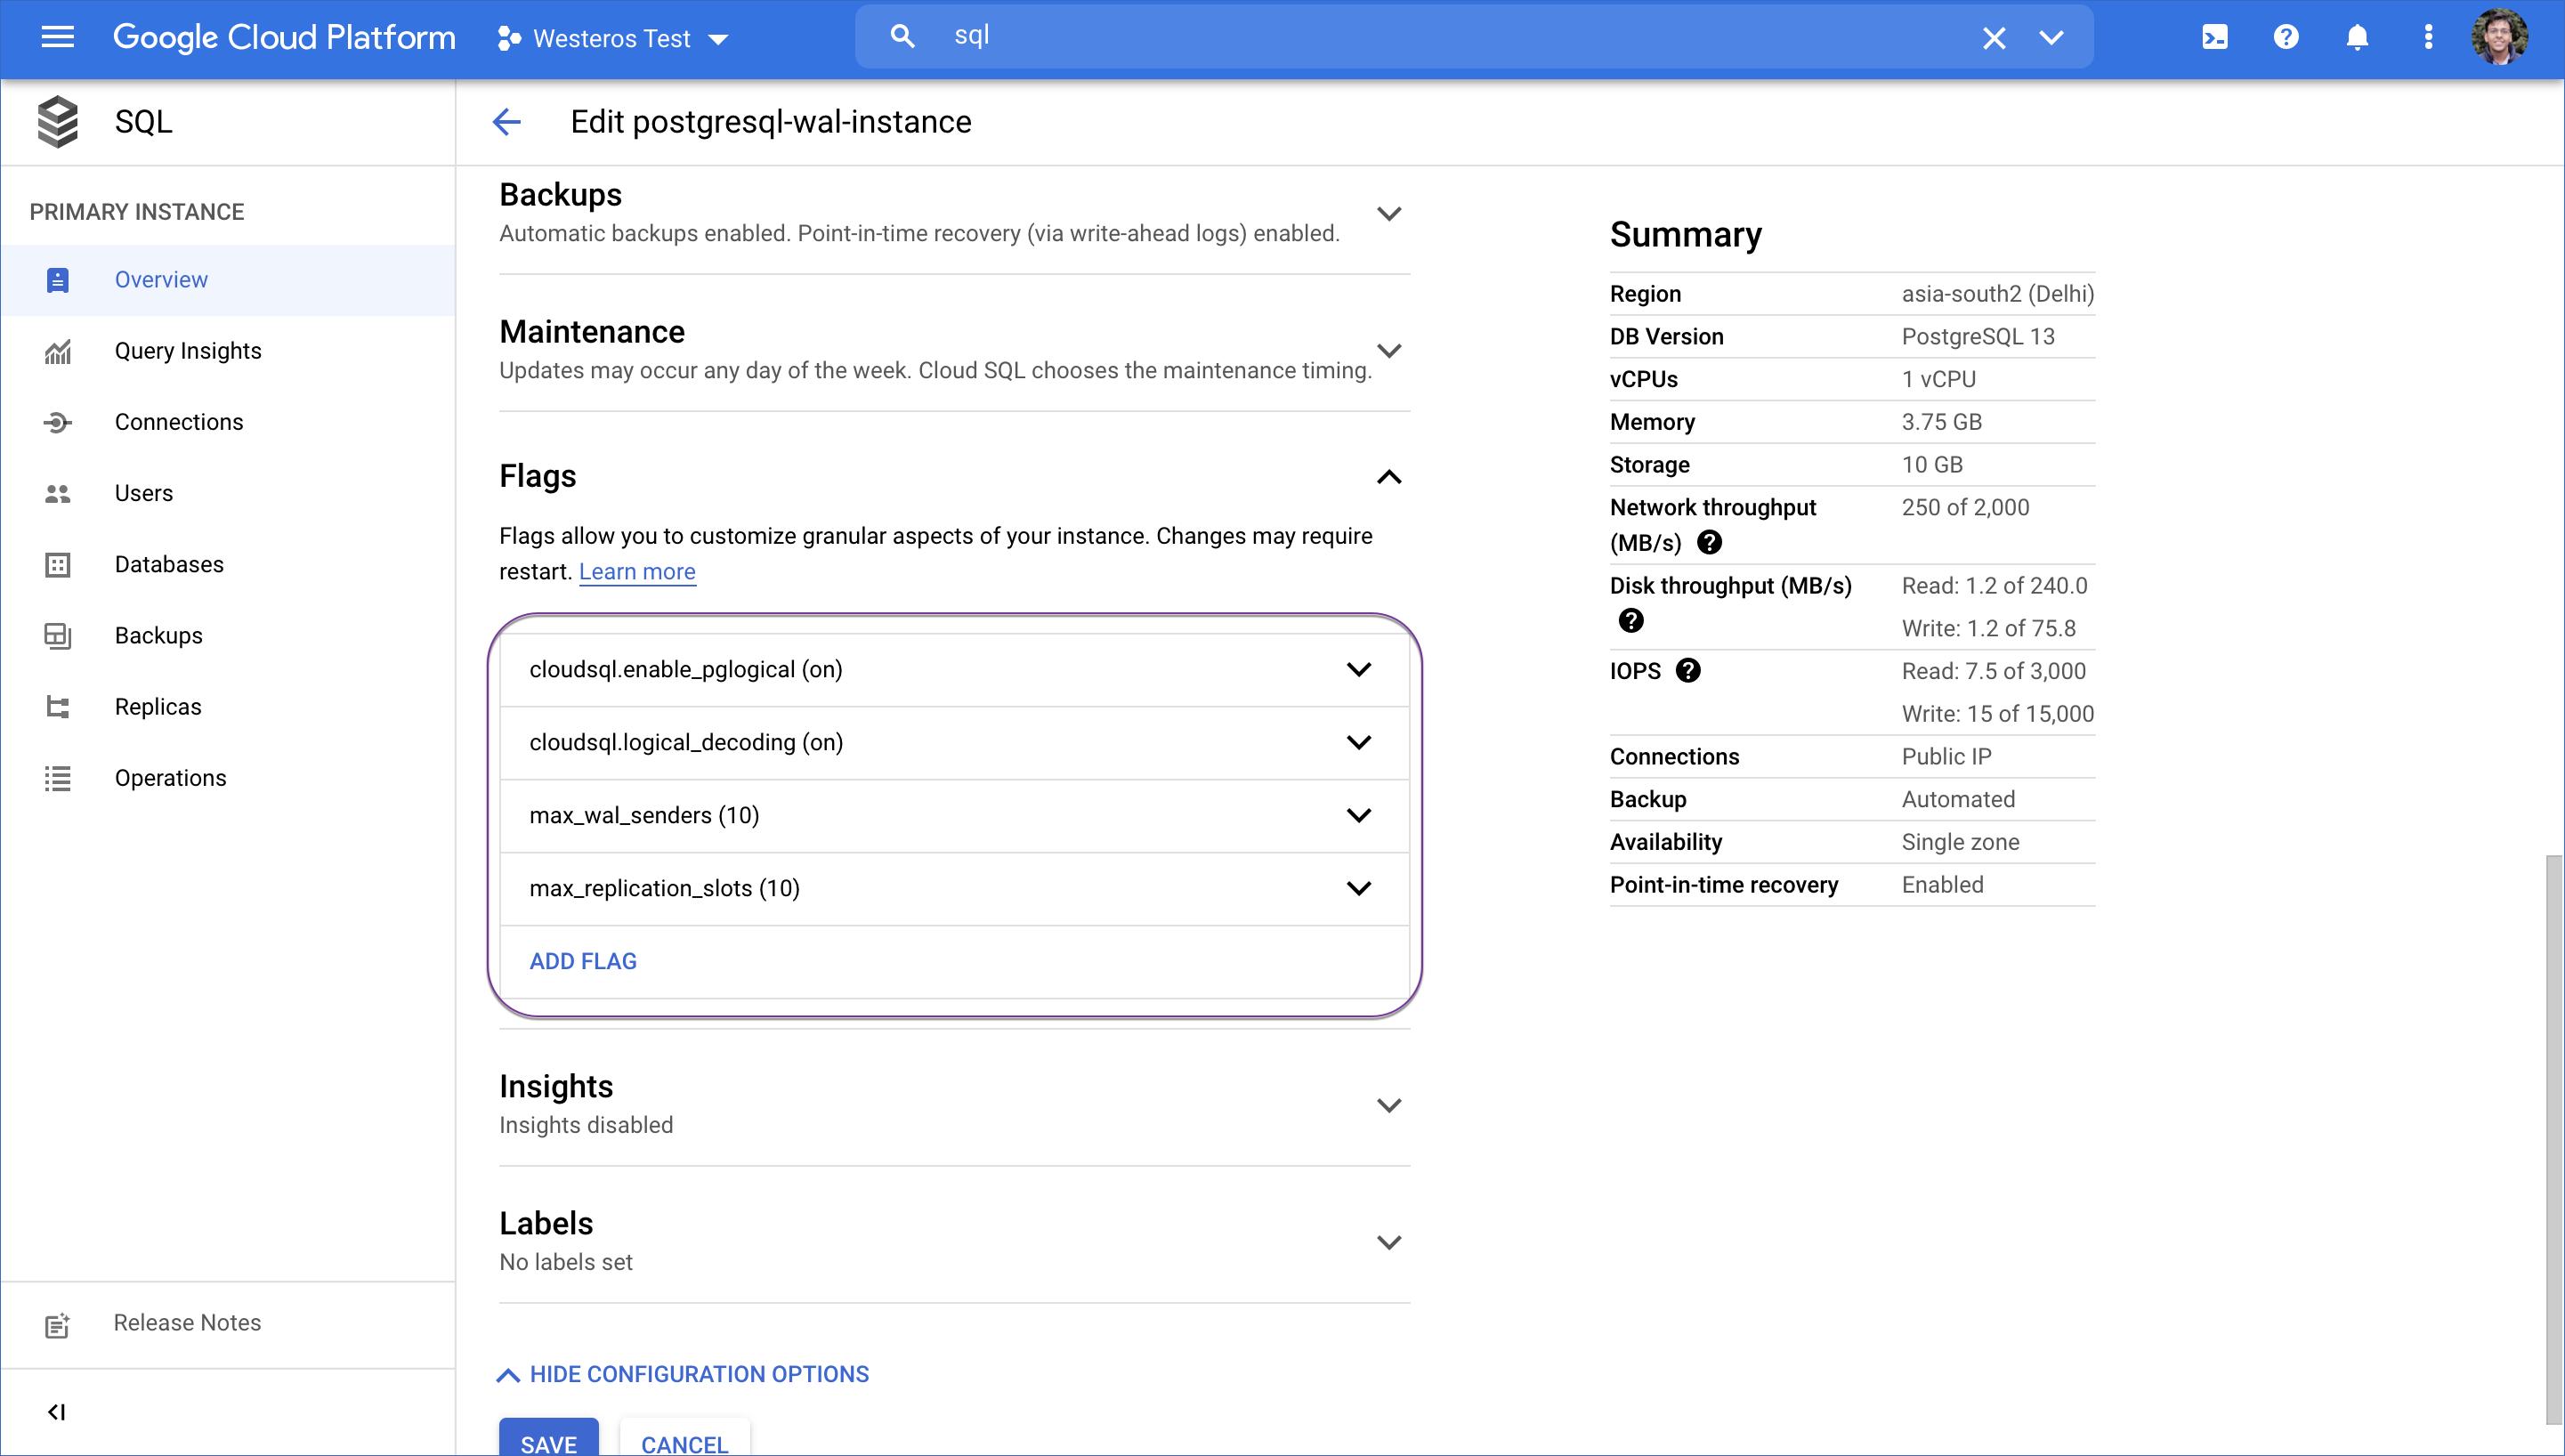 Google Cloud PostgreSQL flags values